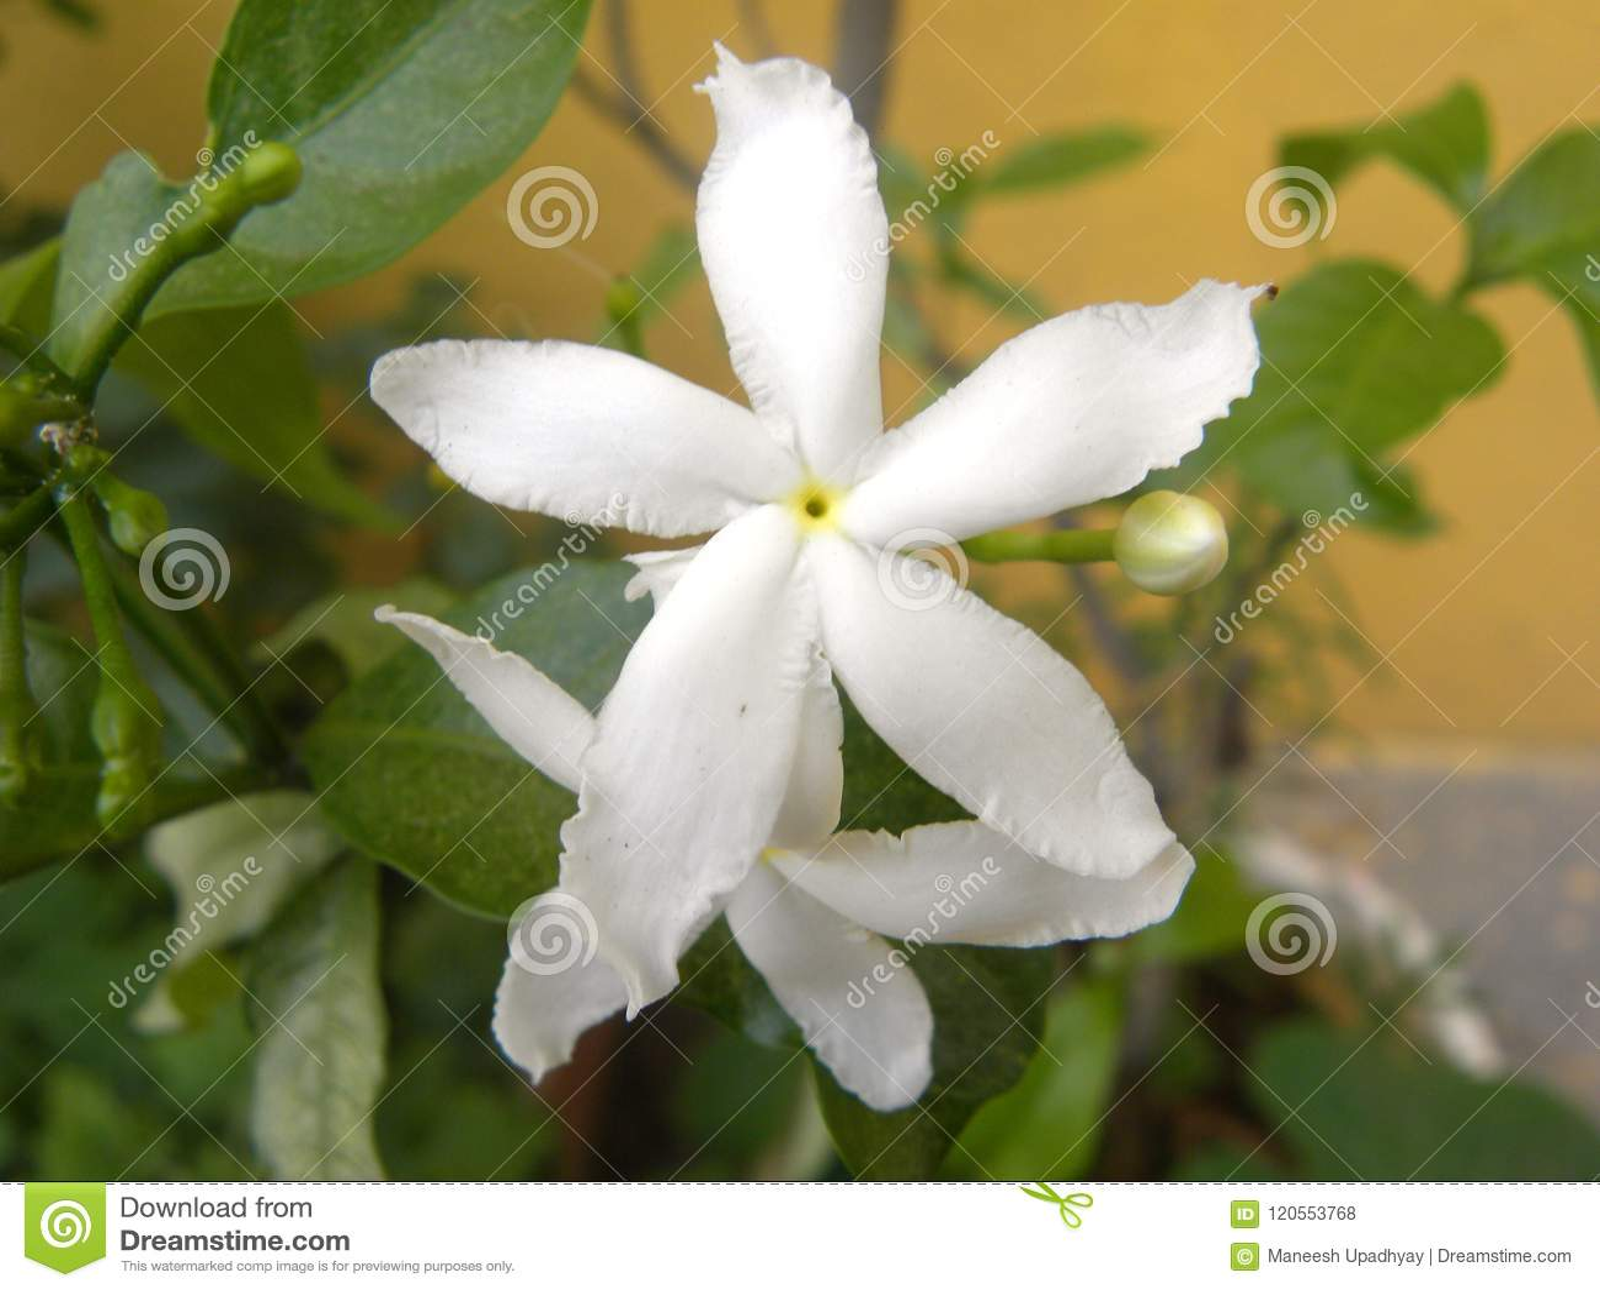 Small white color flower of crape jasmine plant stock photo image small white color flower of crape jasmine plant izmirmasajfo